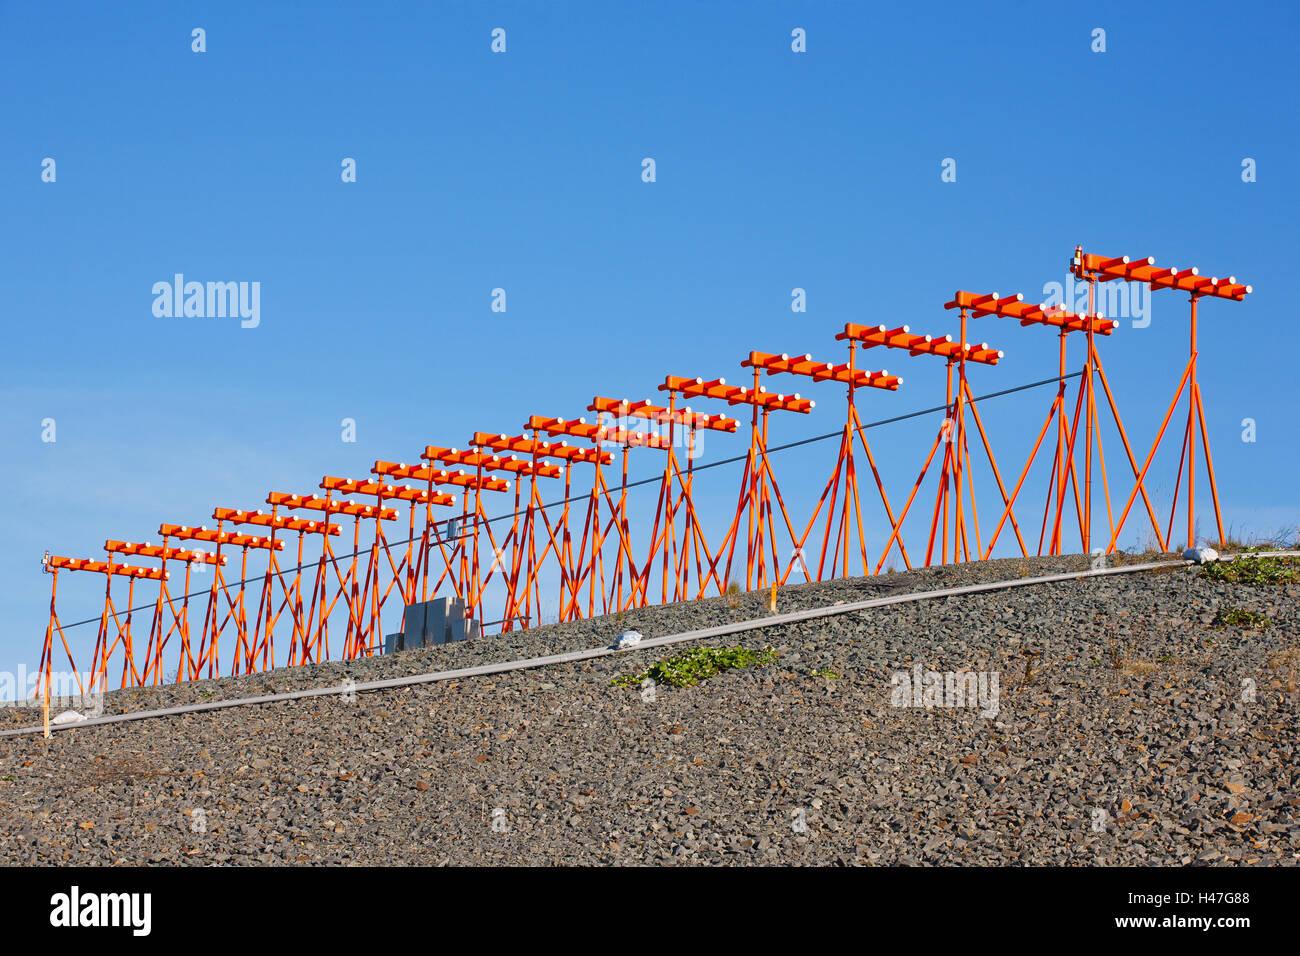 Instrument landing system antenna. - Stock Image